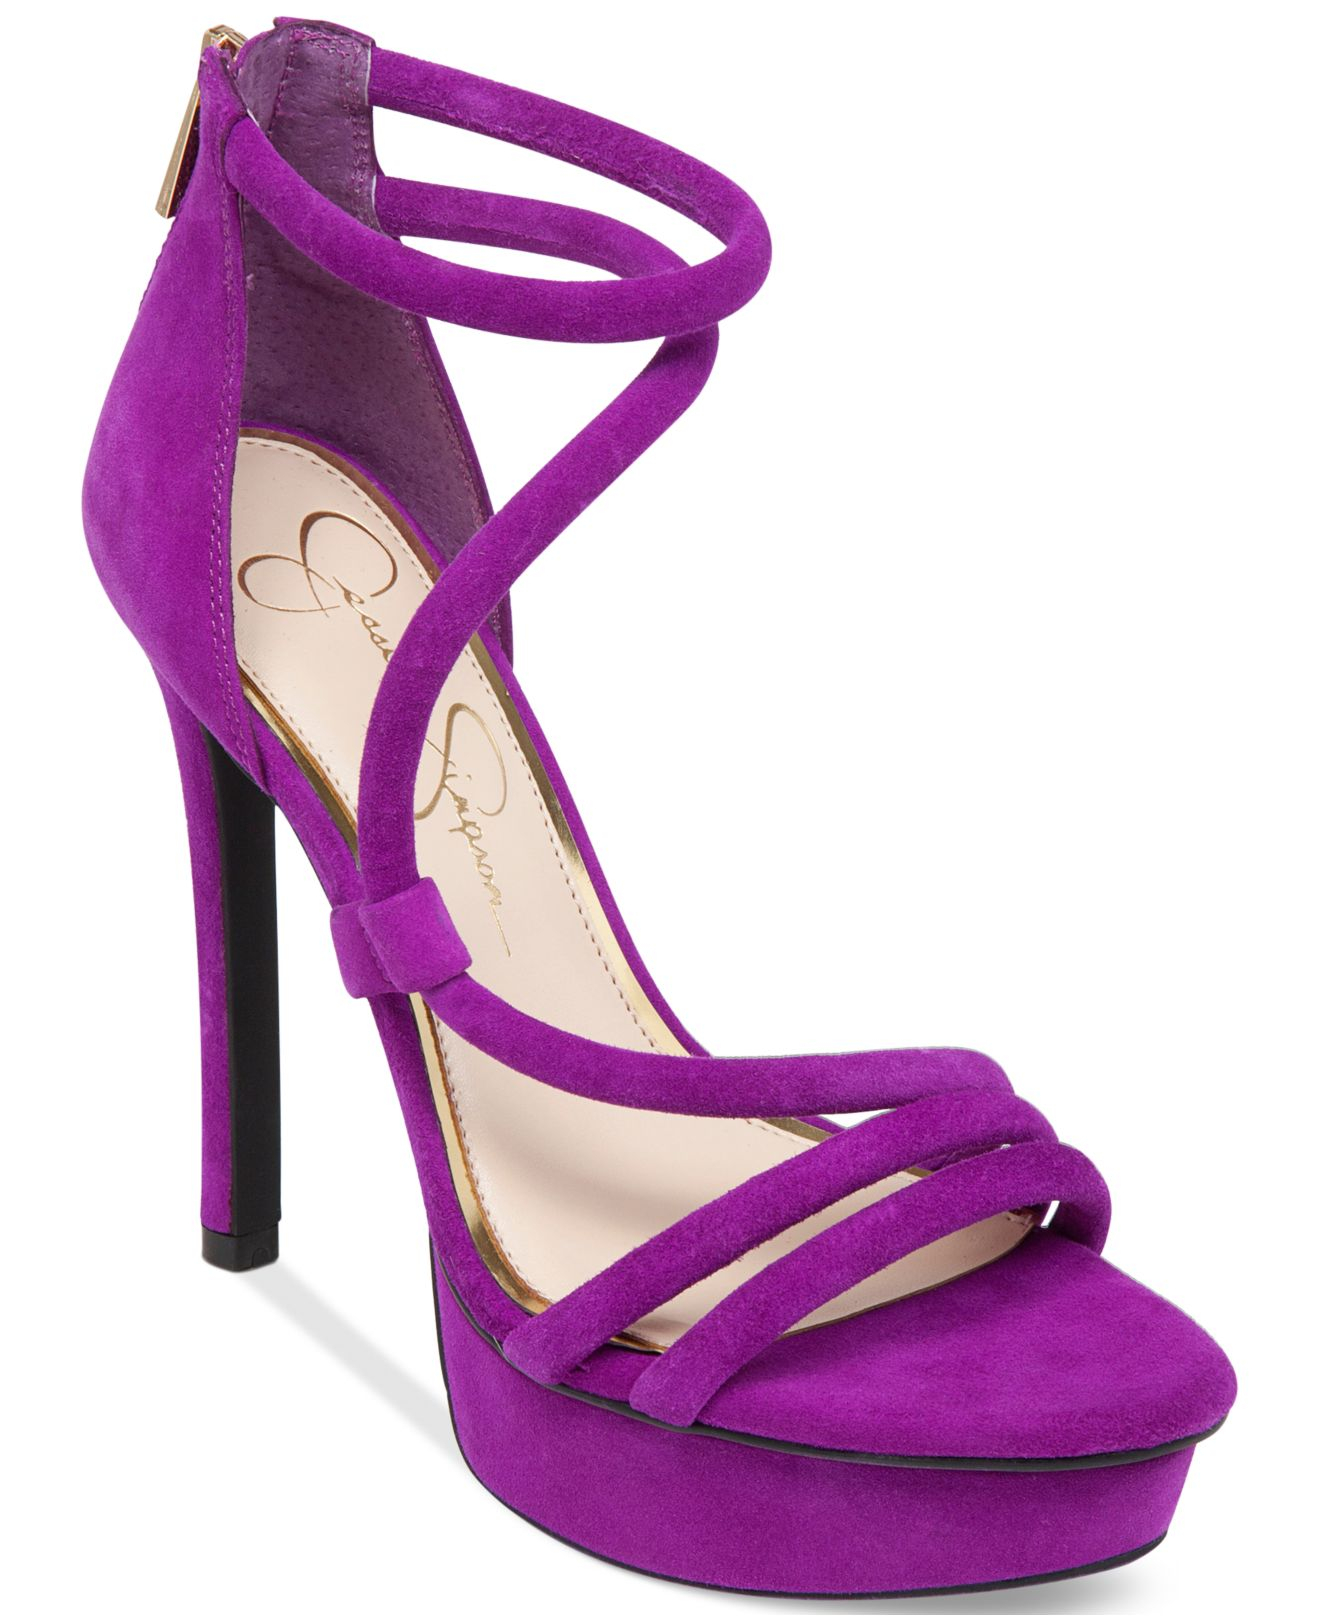 Talbots Shoes Heels